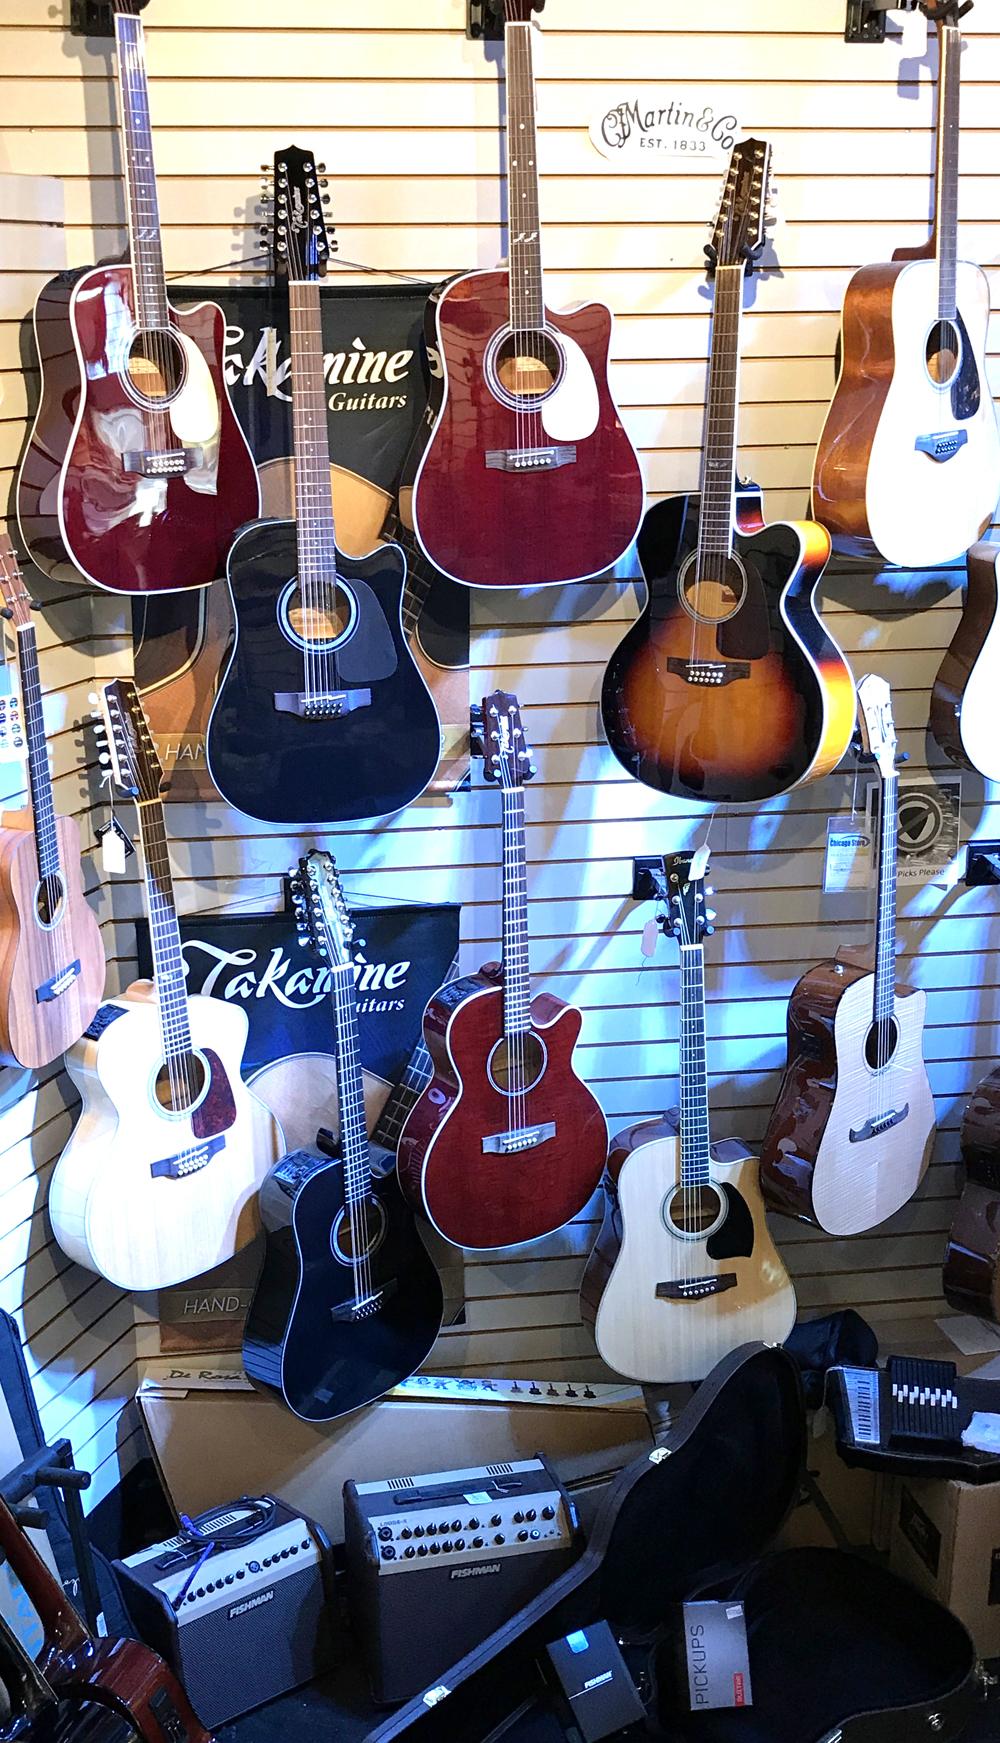 takamine guitars in stock chicago music store. Black Bedroom Furniture Sets. Home Design Ideas